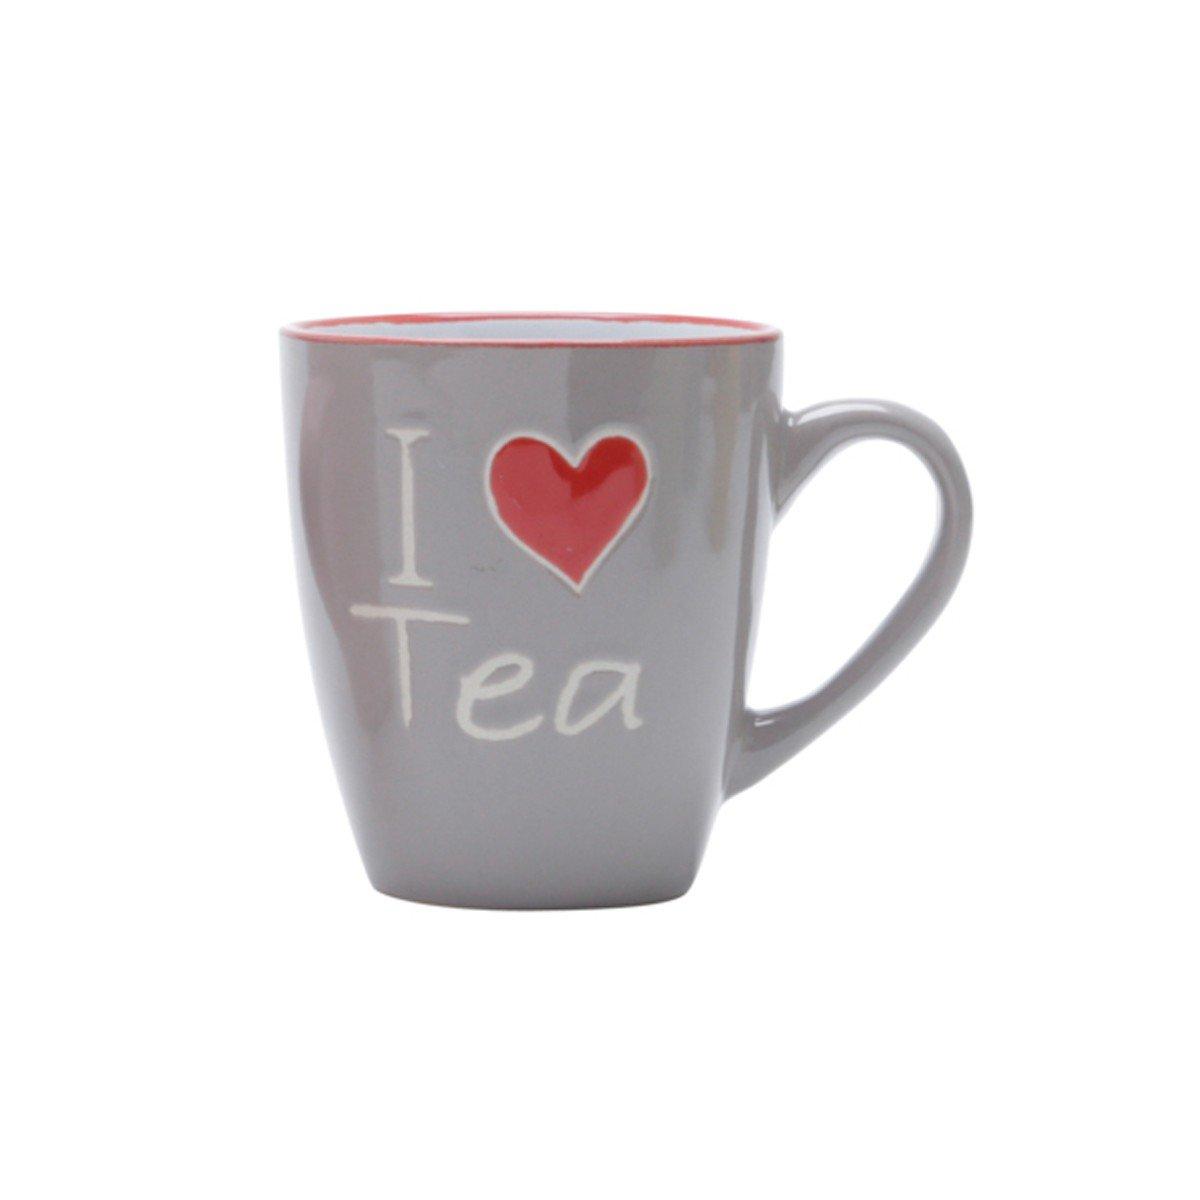 caneca porcelana i love tea 200ml bon gourmet cinza 26103c bon goumert casa cafe e mel